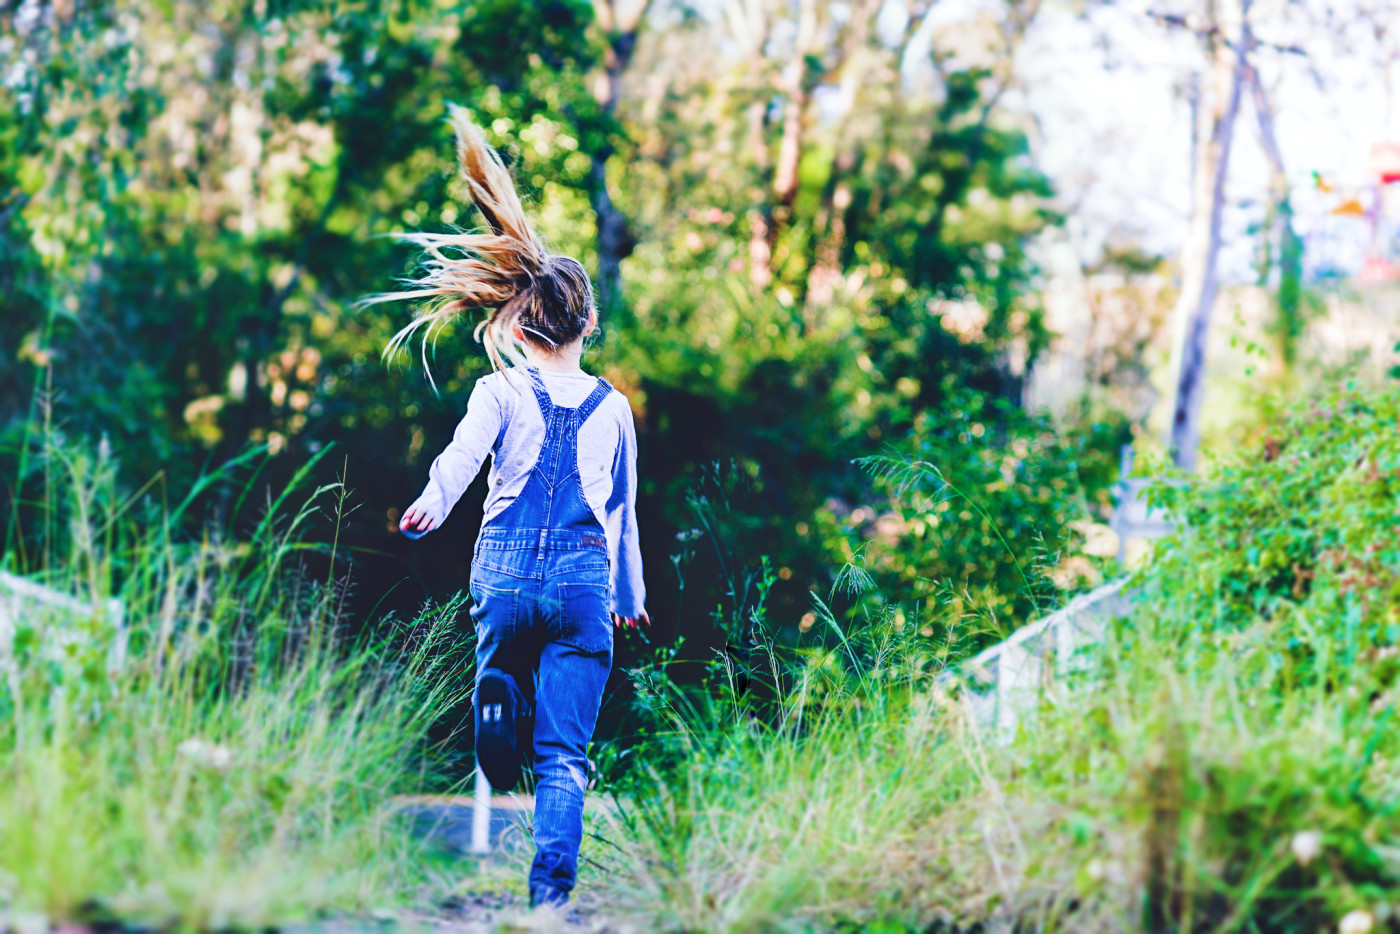 Photographersydney/girl at old bridge wearing denim overalls